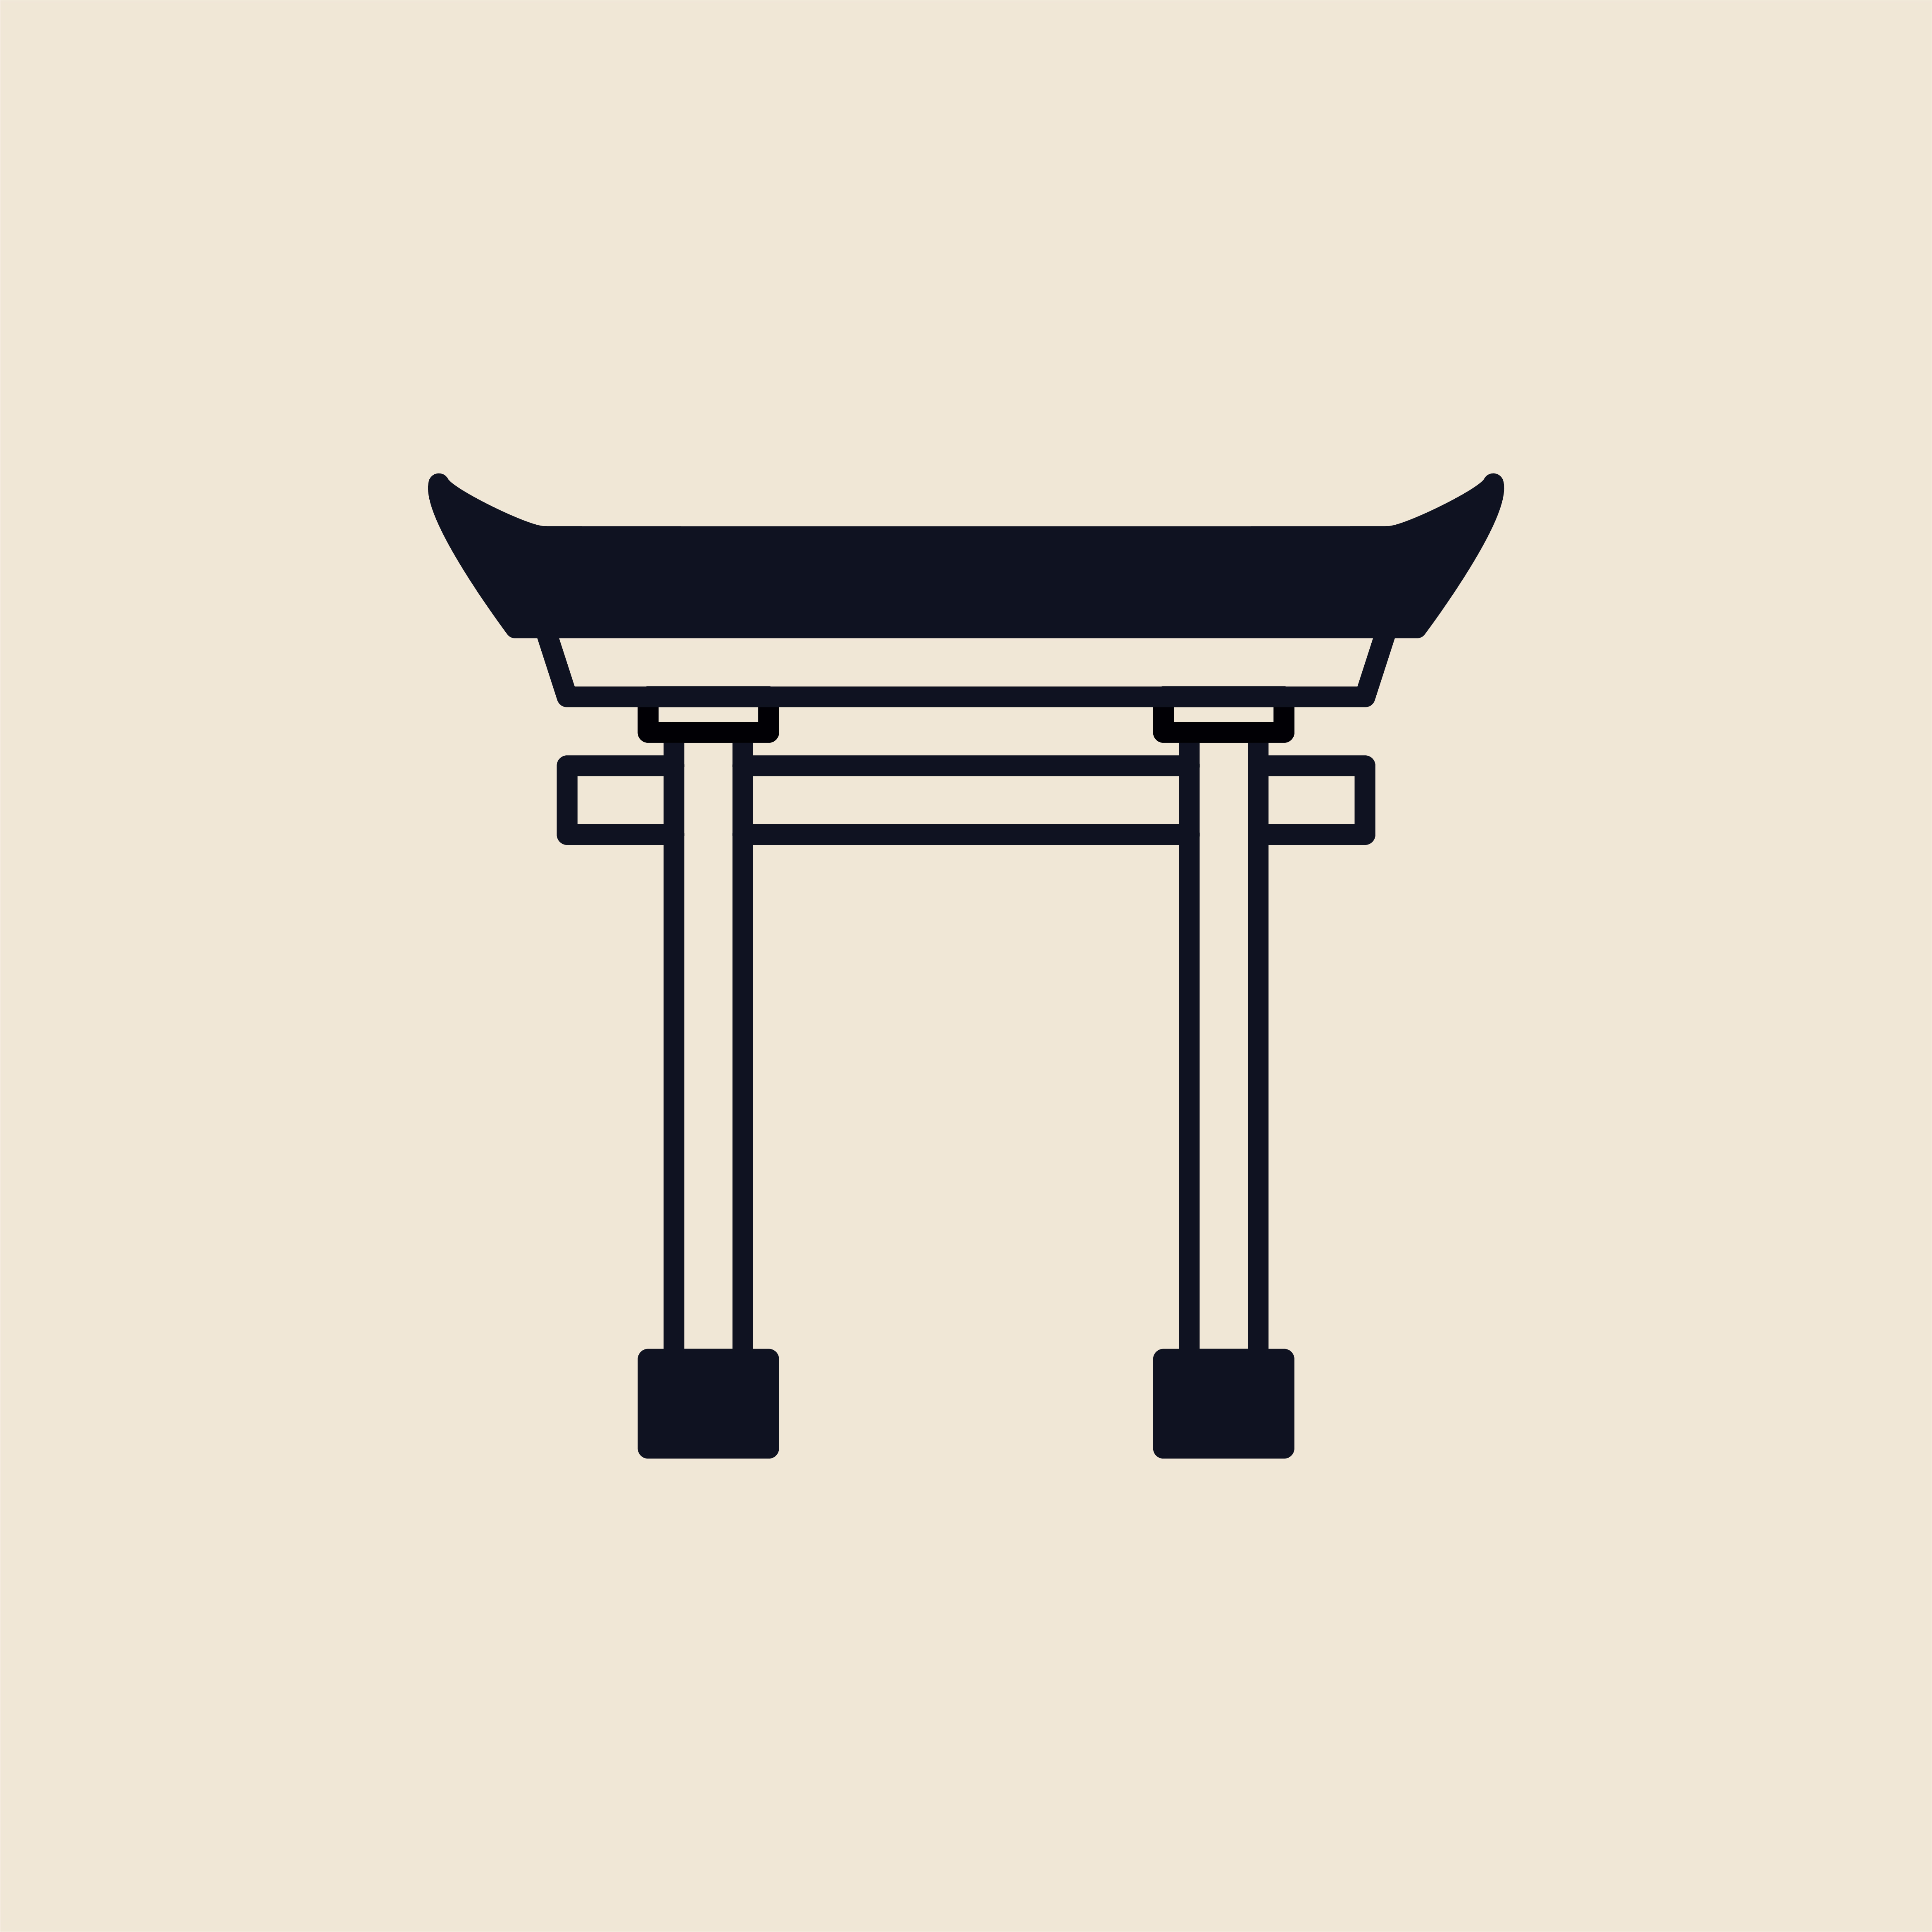 Illustration of a Torii gate - Download Free Vectors ...